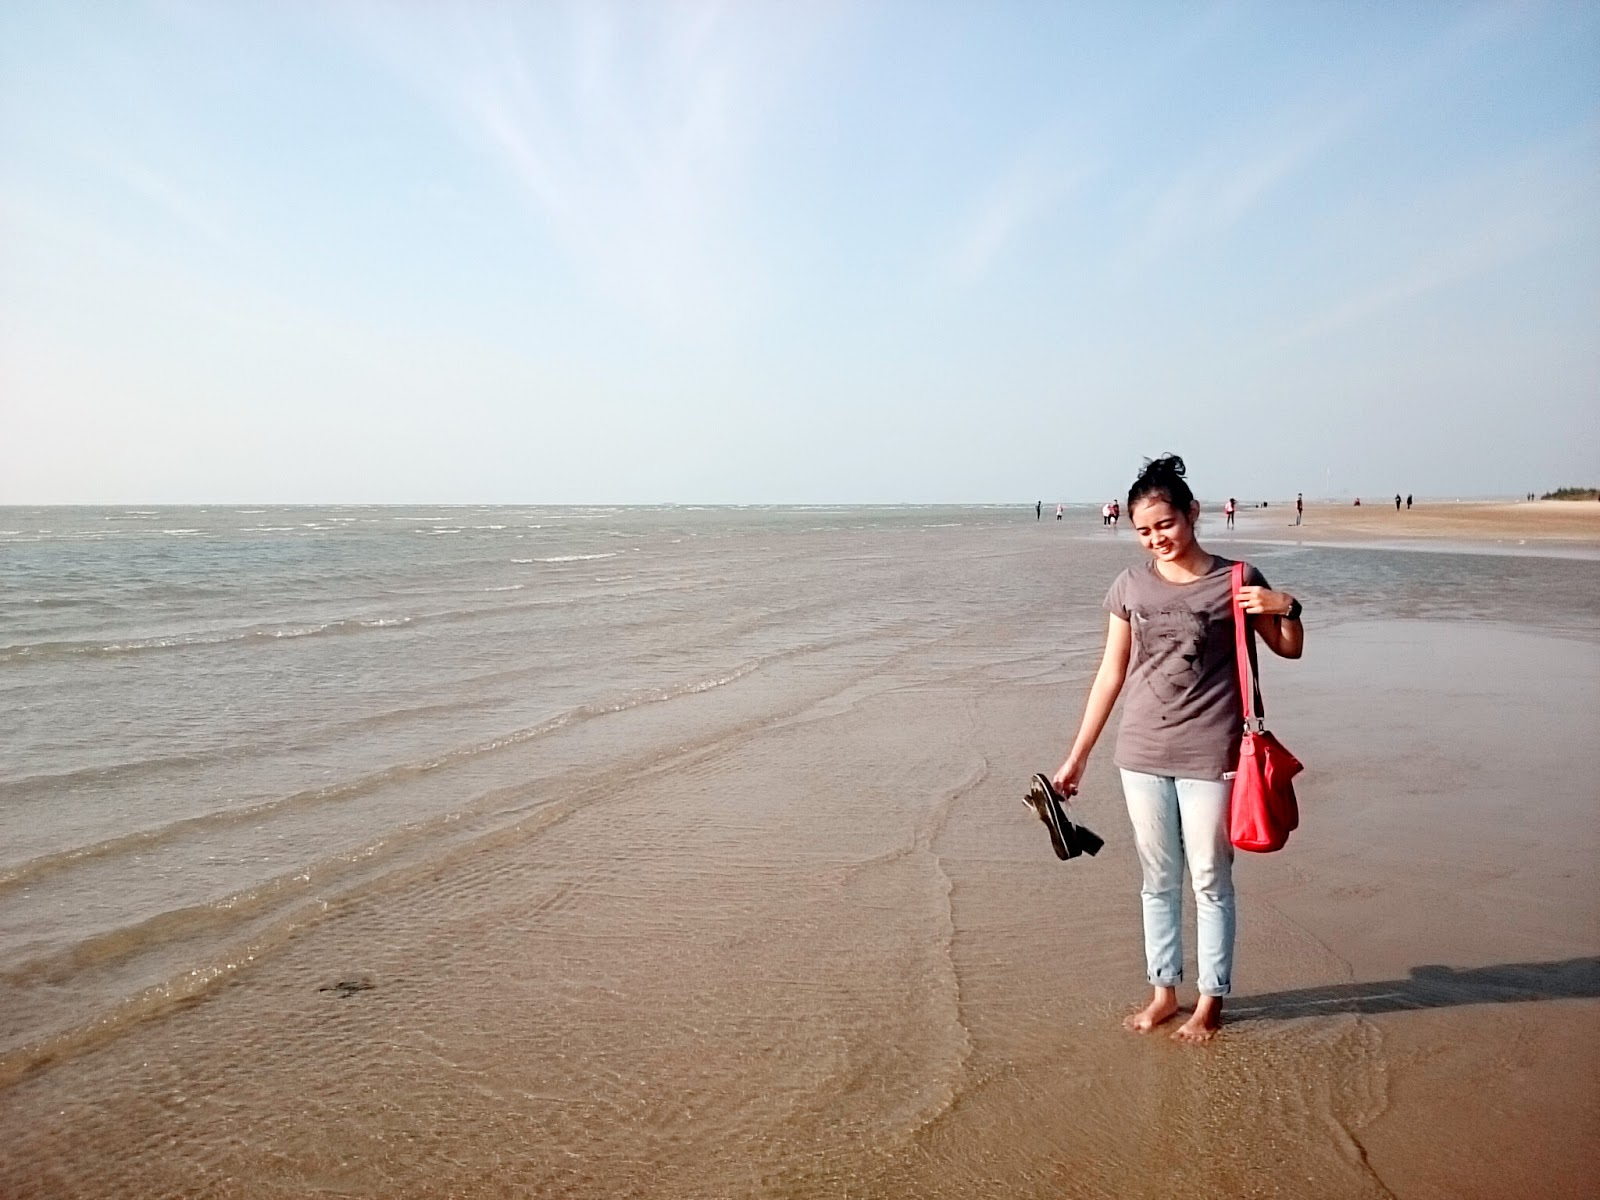 Karang Jahe Beach Lets Happinest Pantai Kabupaten Rembang Kab